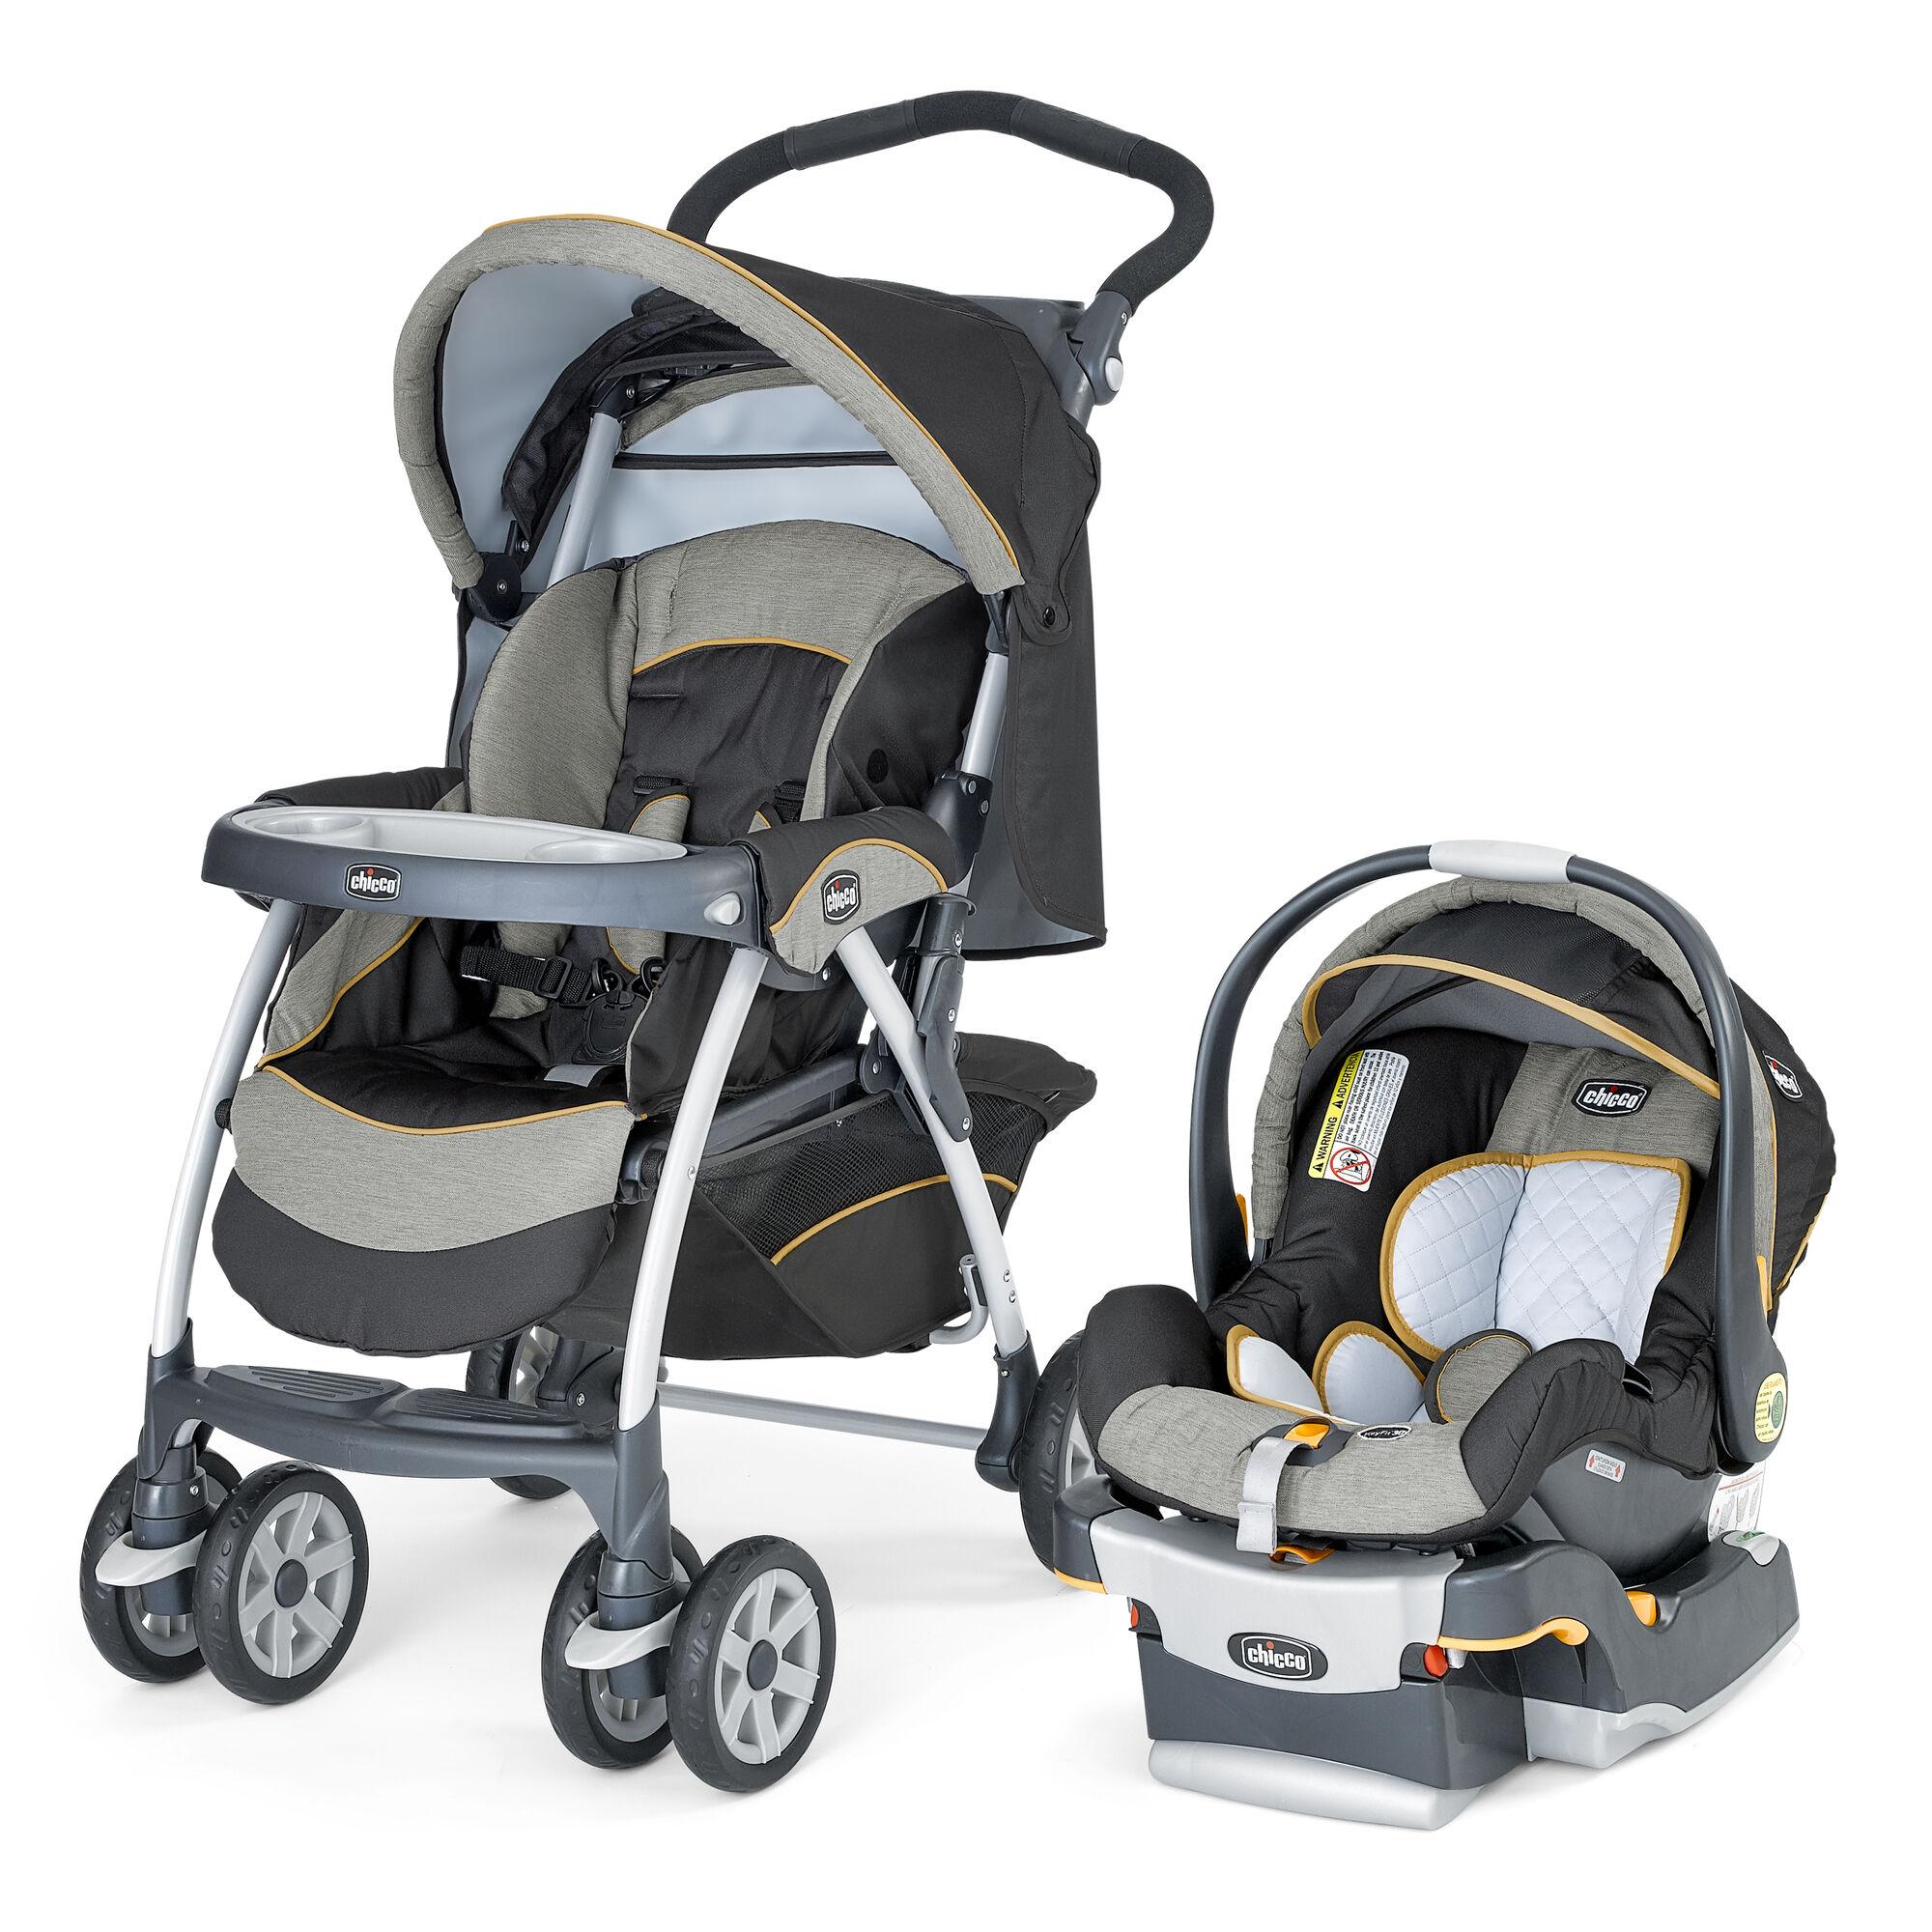 Keyfit 30 Stroller >> Chicco Cortina Keyfit 30 Travel System Sedona